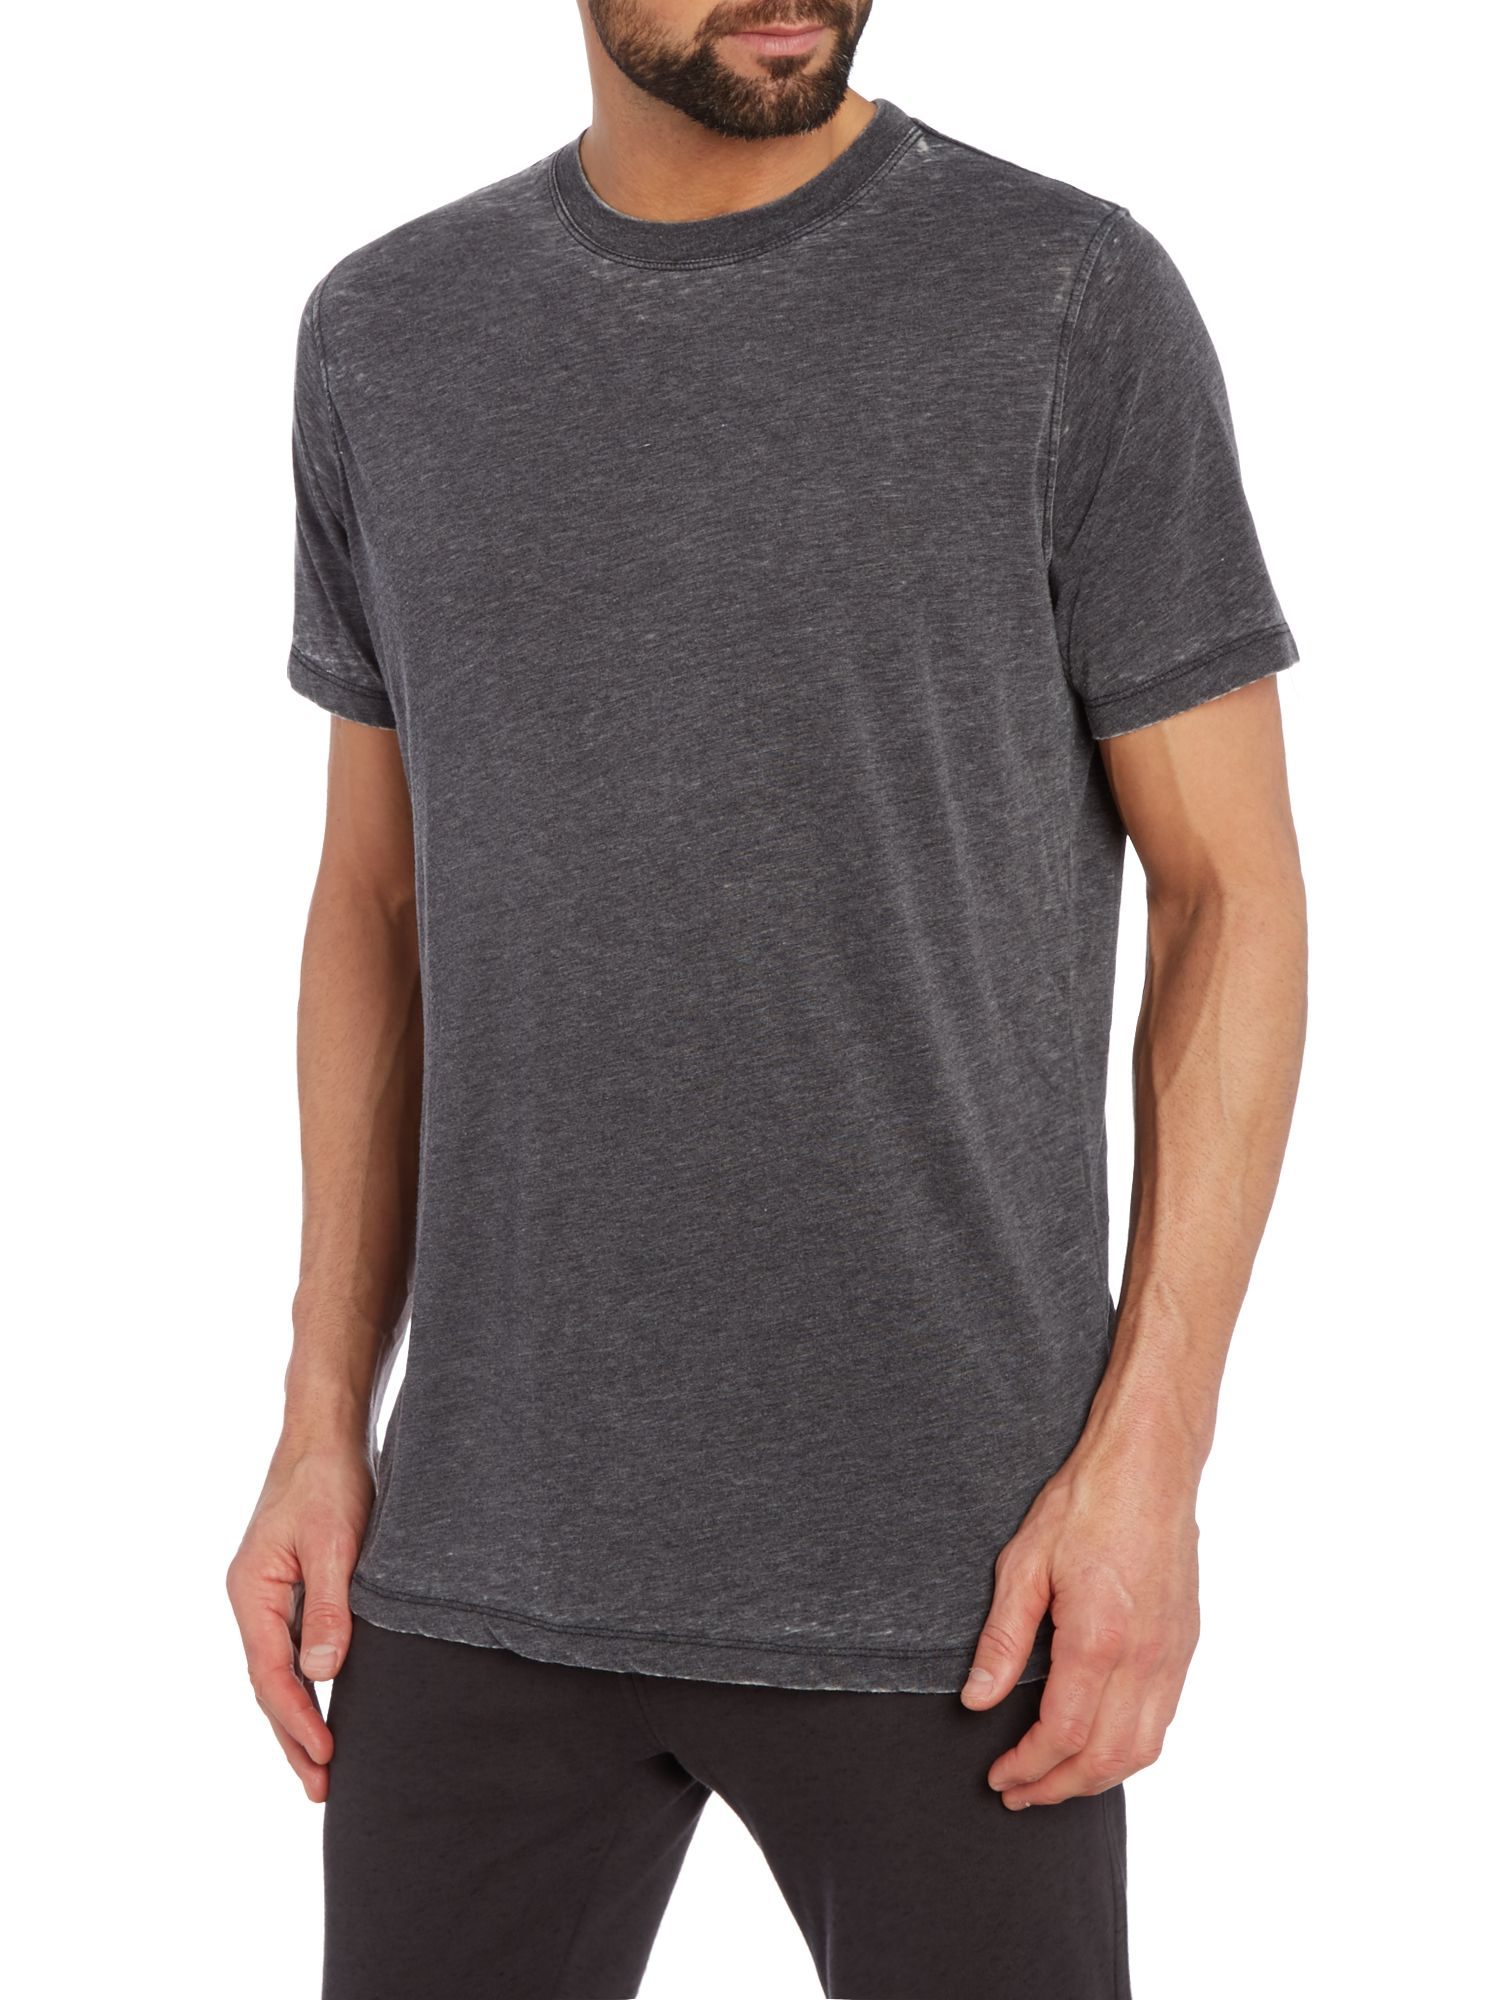 Acid Wash Black T Shirt